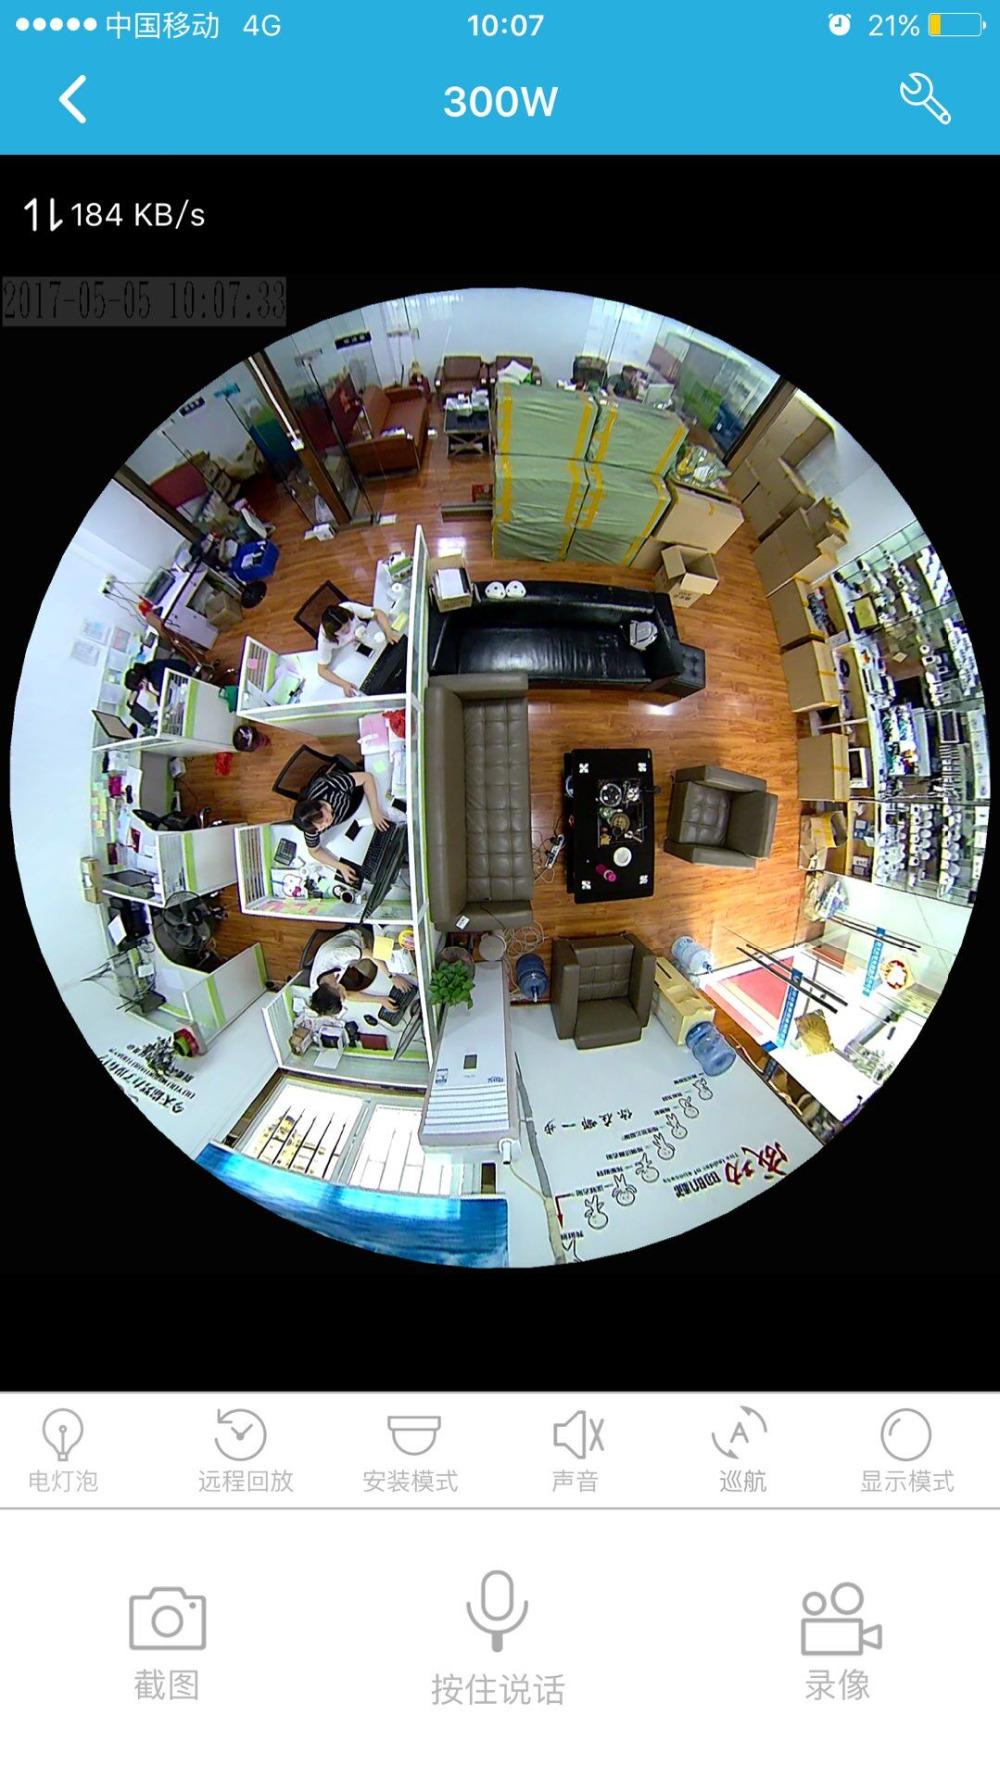 360 camera panoramic